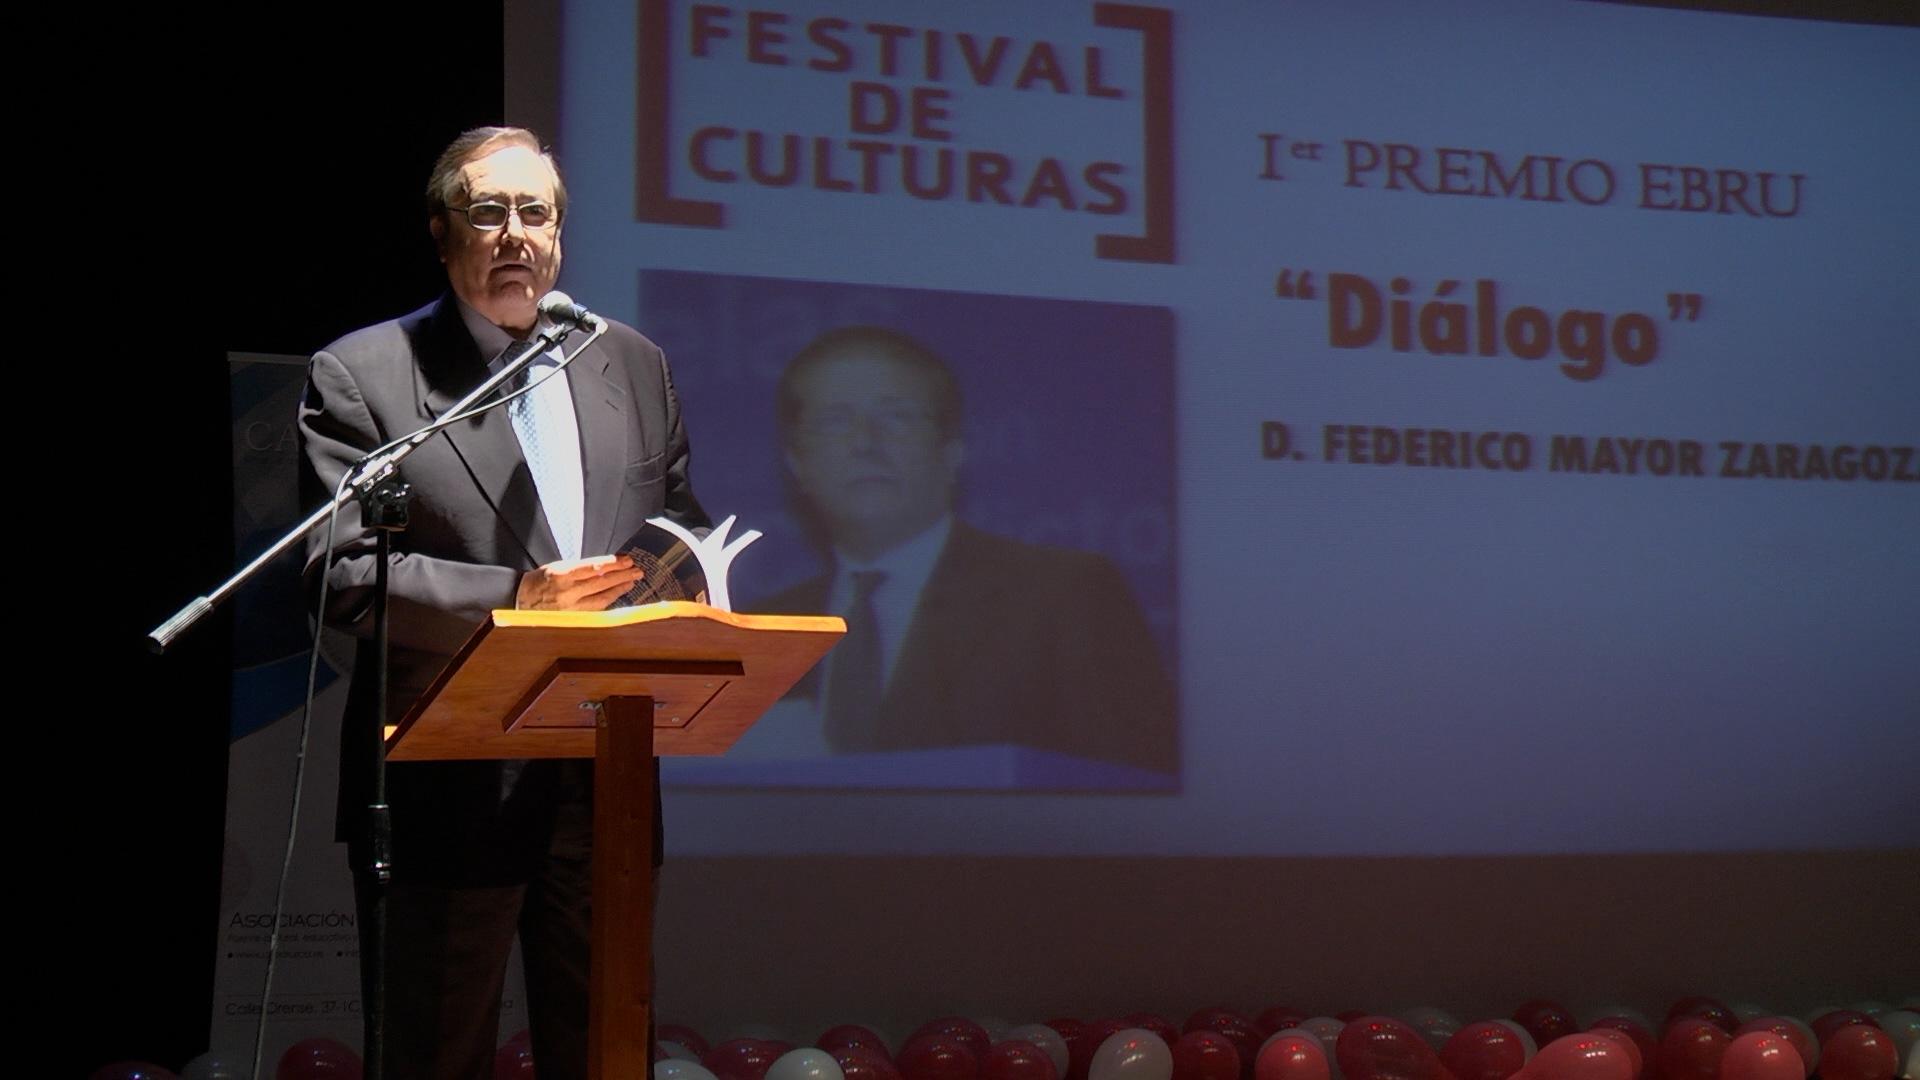 Premios Ebru 2013 (4)